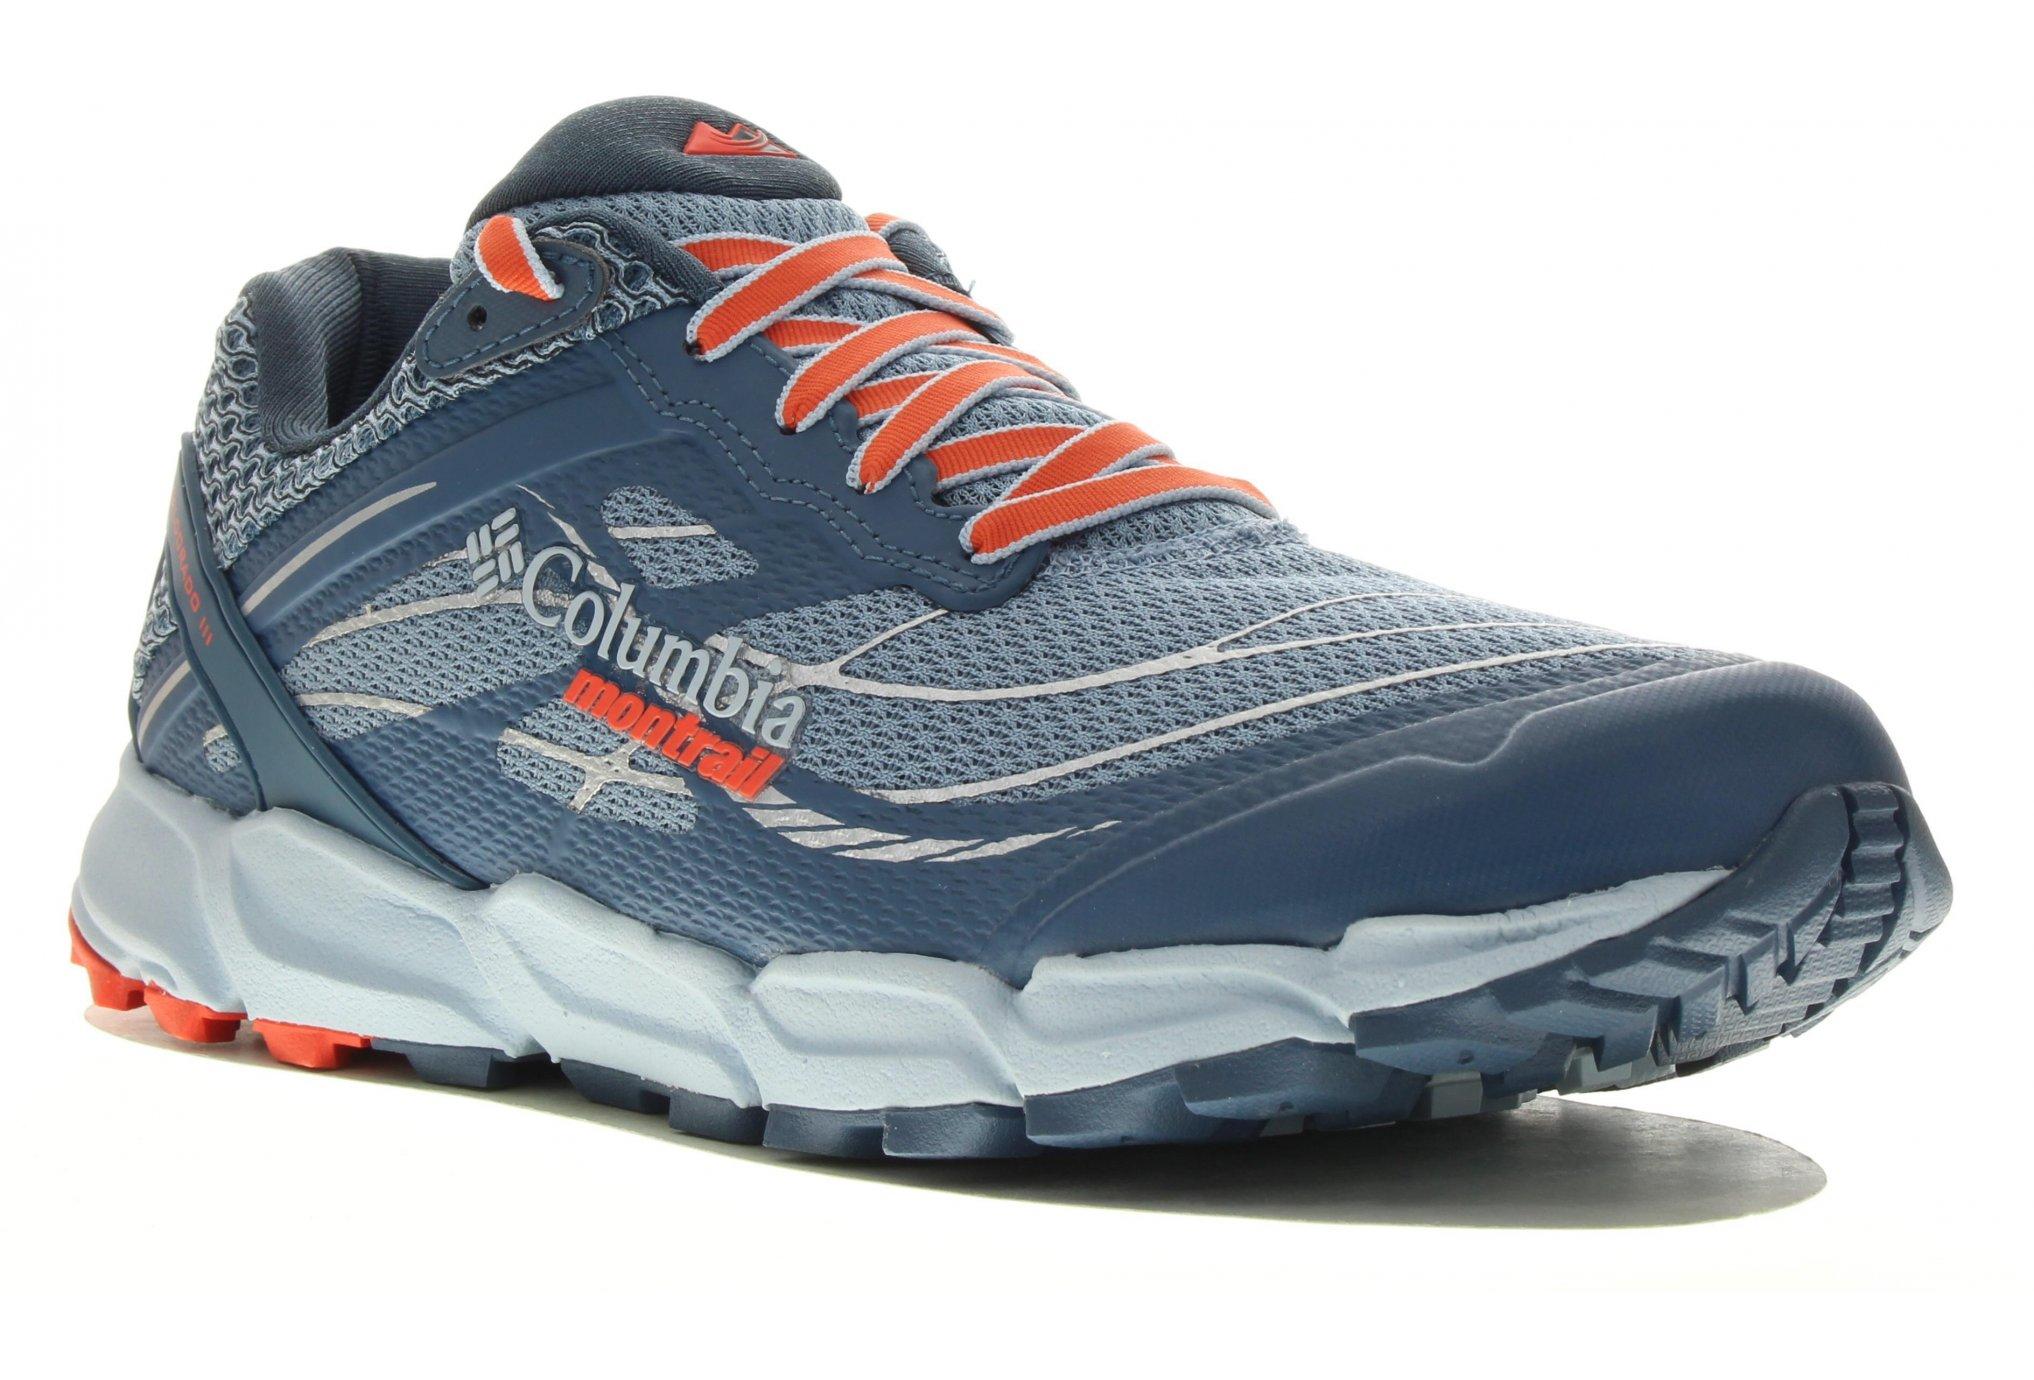 Columbia Caldorado III W Chaussures running femme